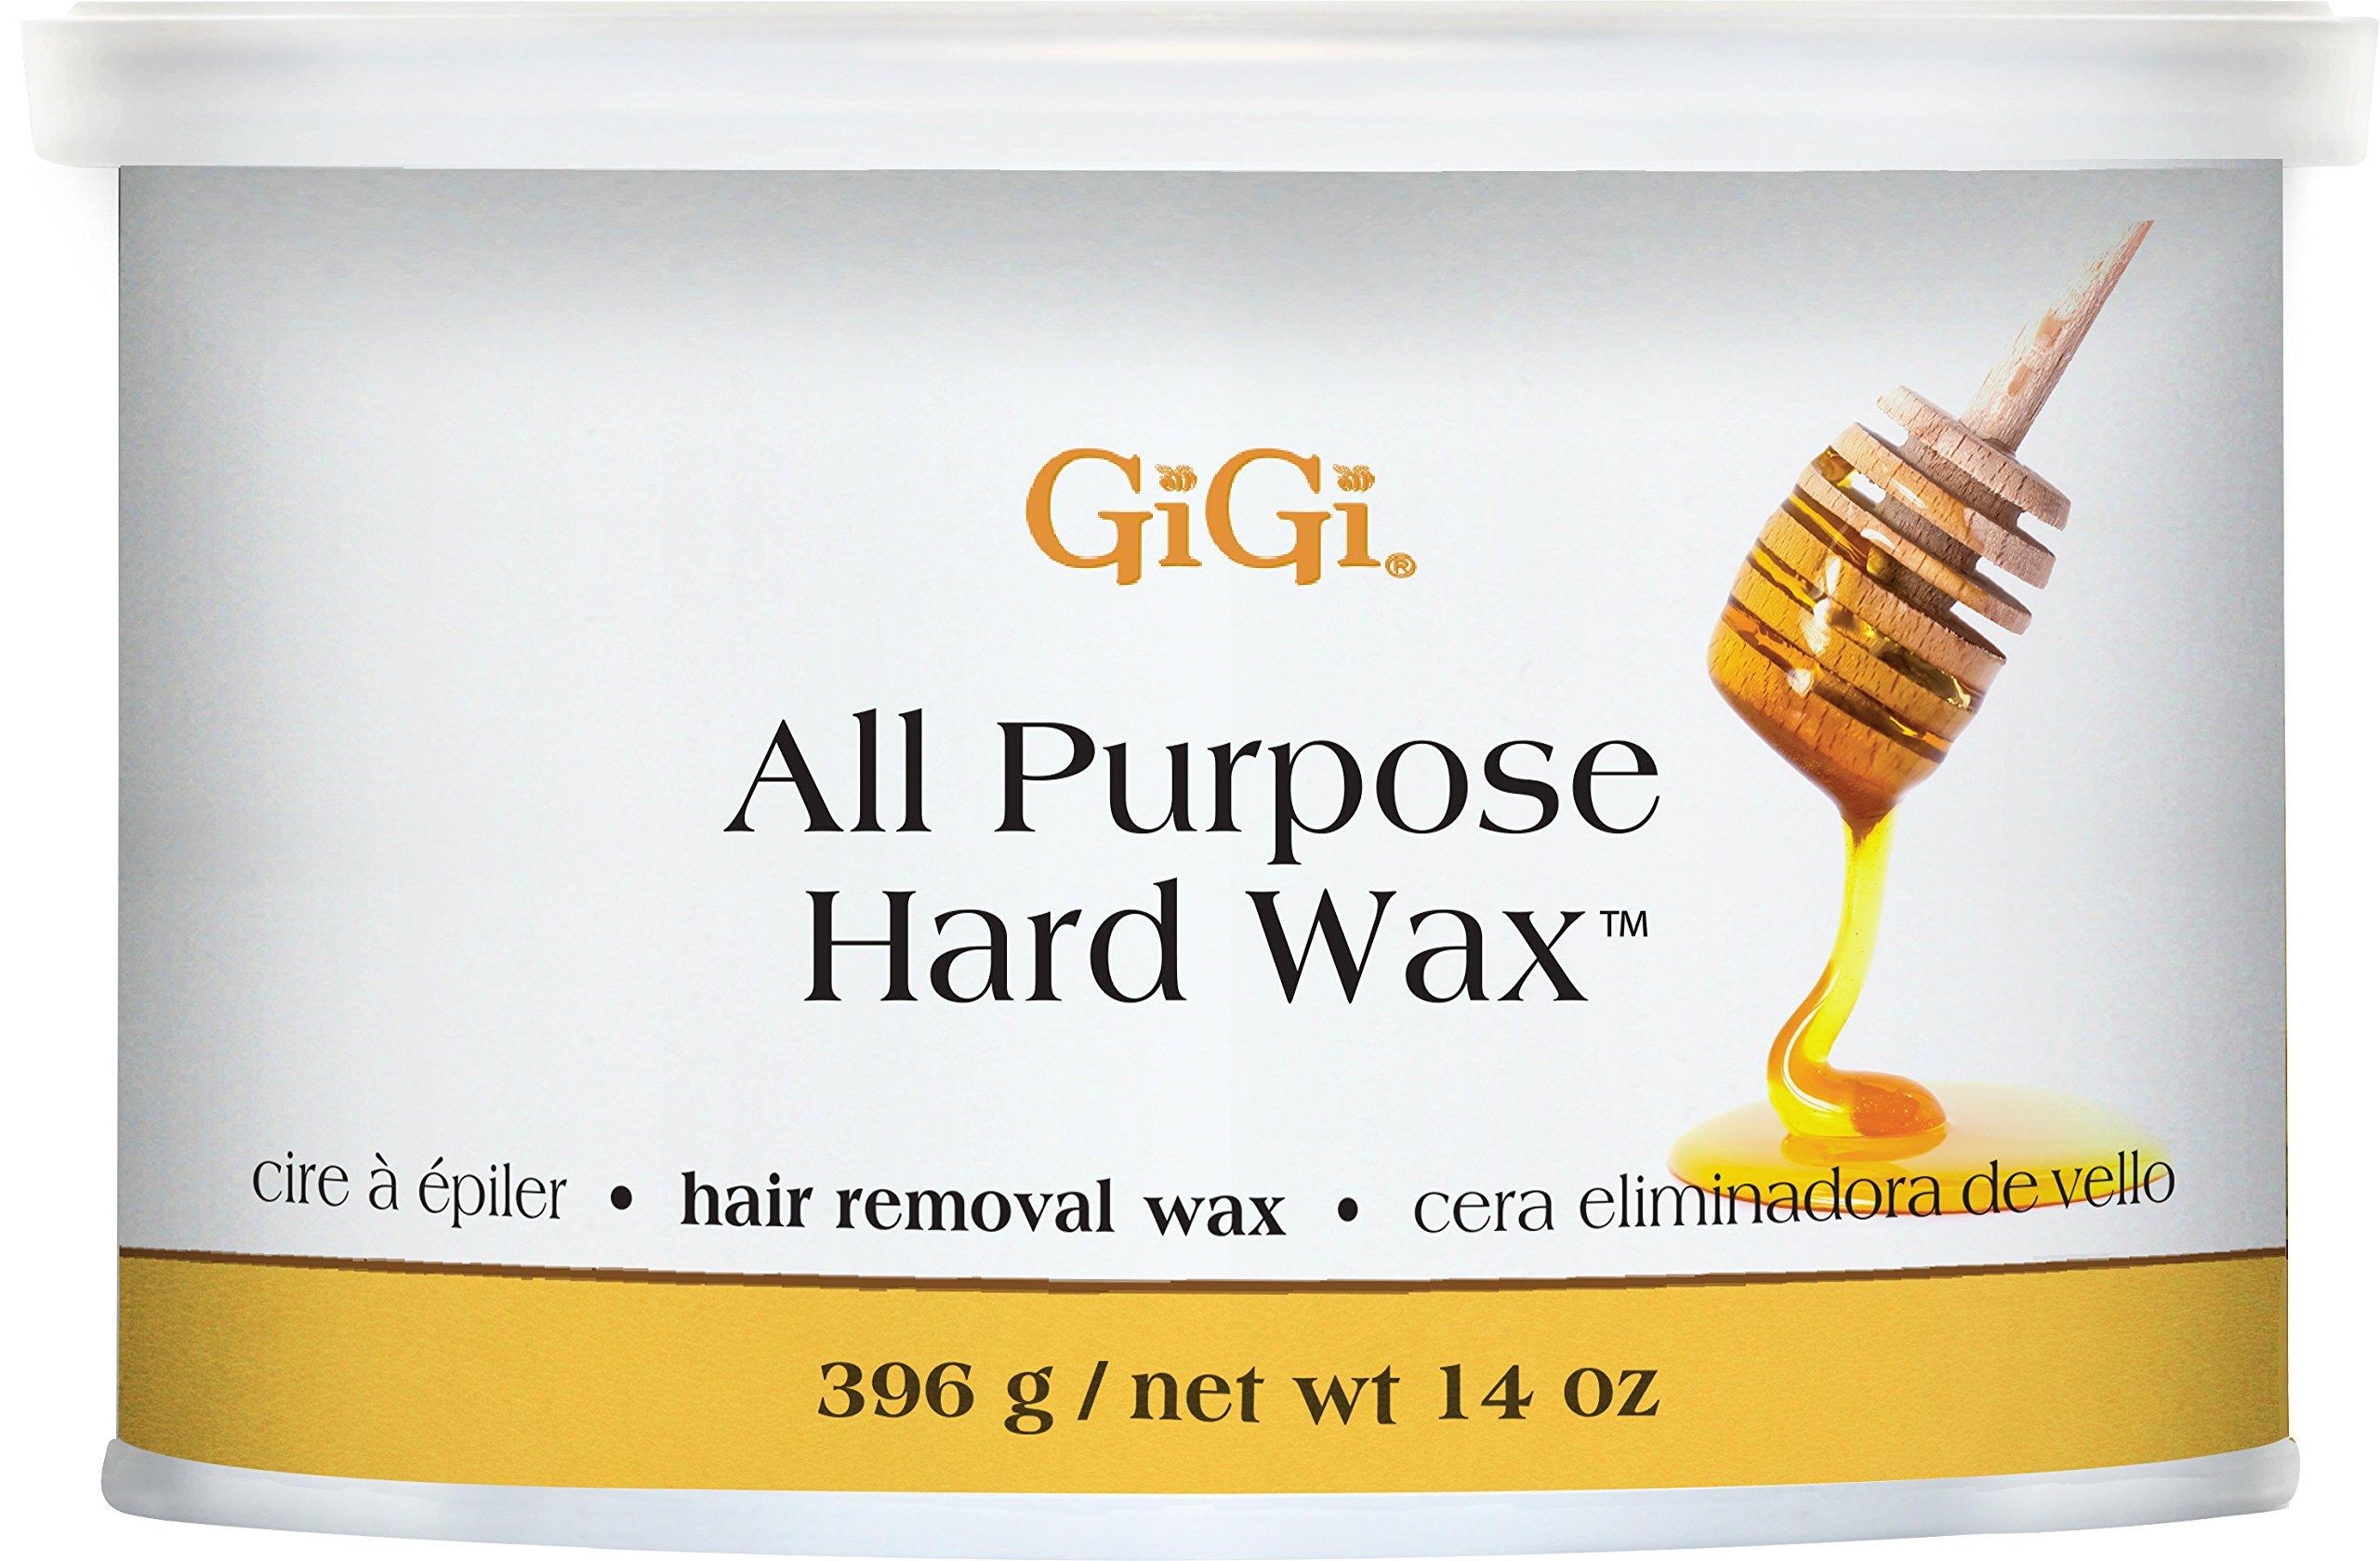 Gigi All Purpose Hard Wax Honey Hair Removal Wax 396 g/net Wt 14 oz